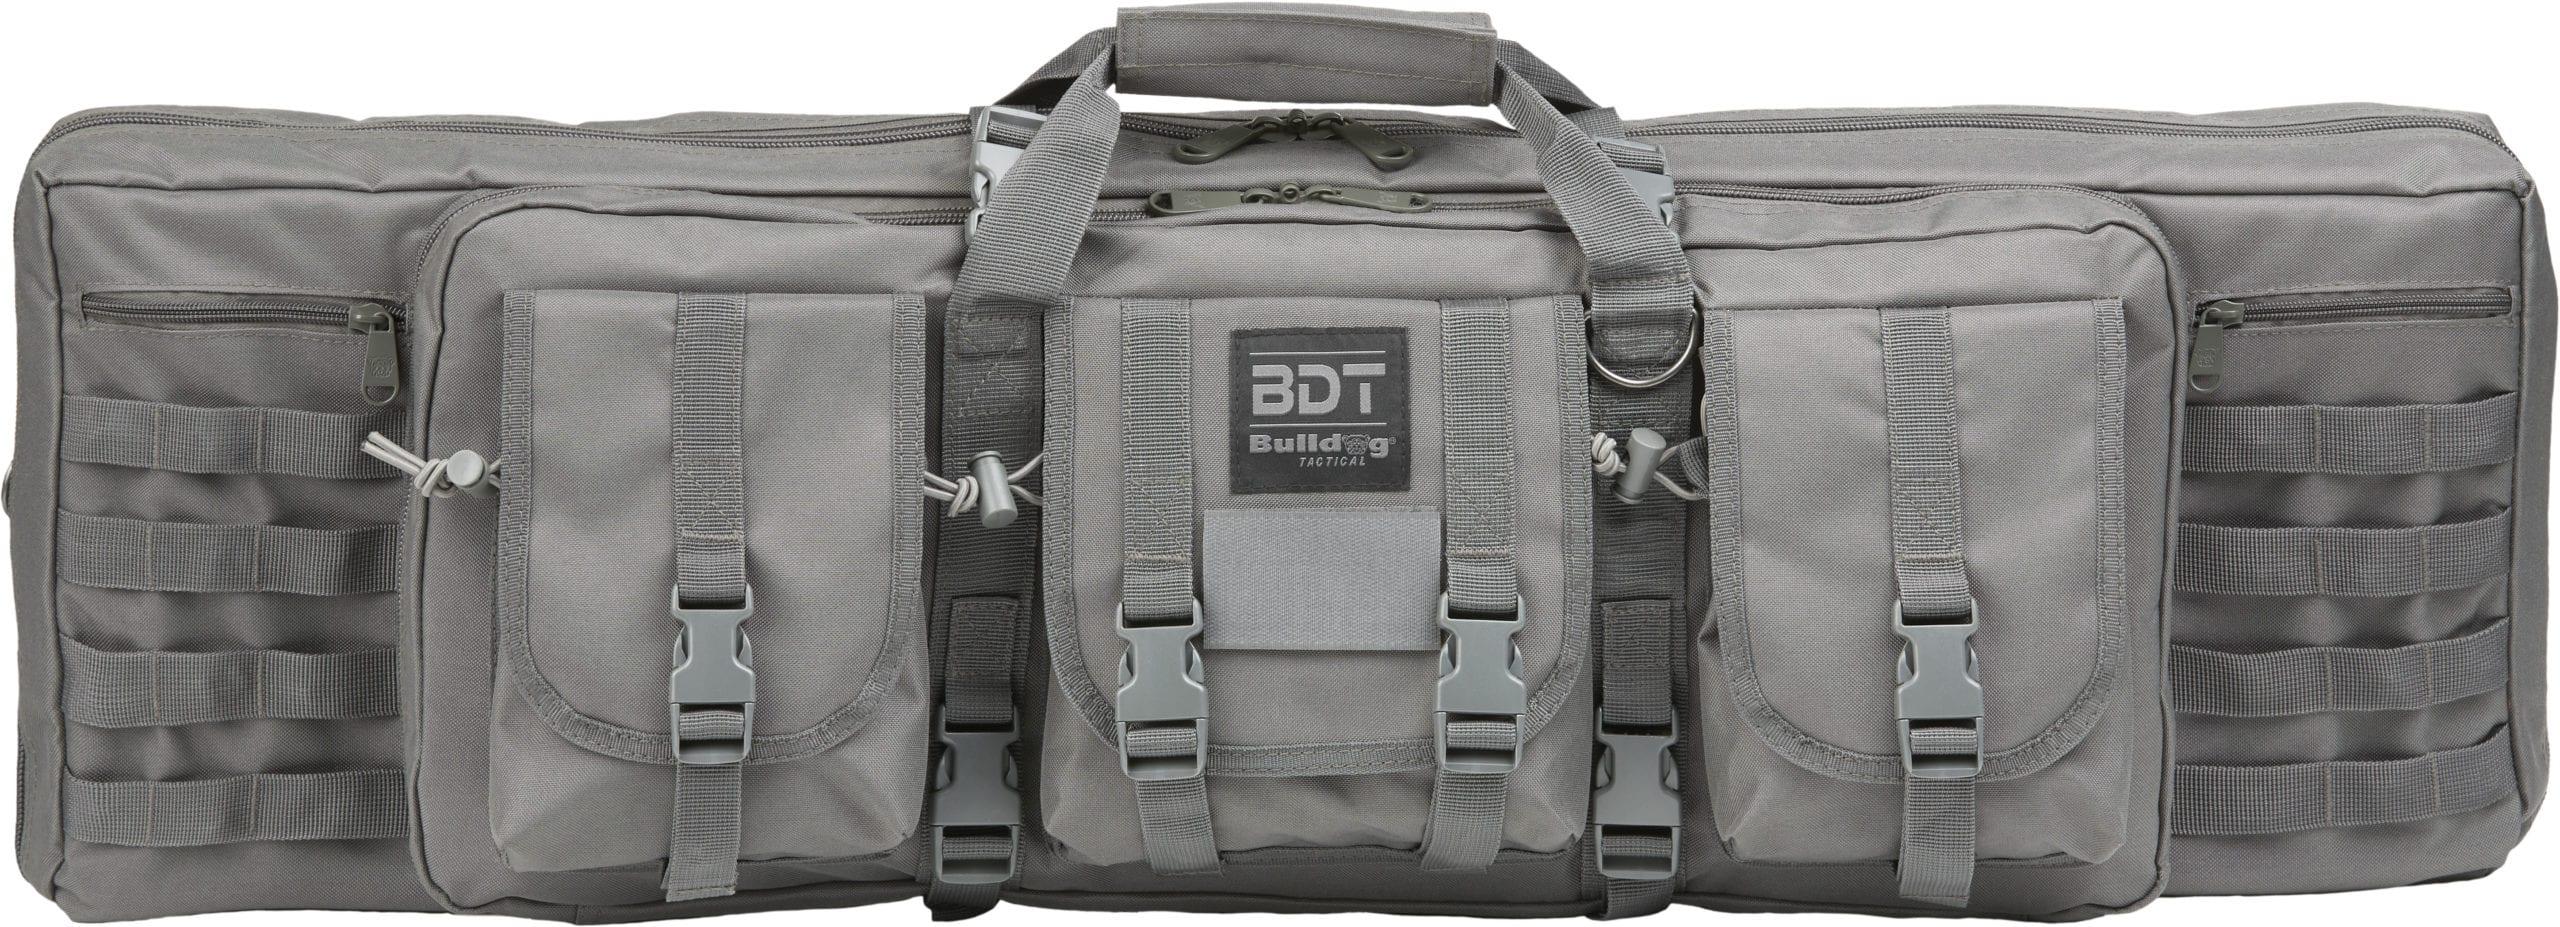 Bulldog Cases BDT TACTICAL- Double - Waffentasche (109 cm)